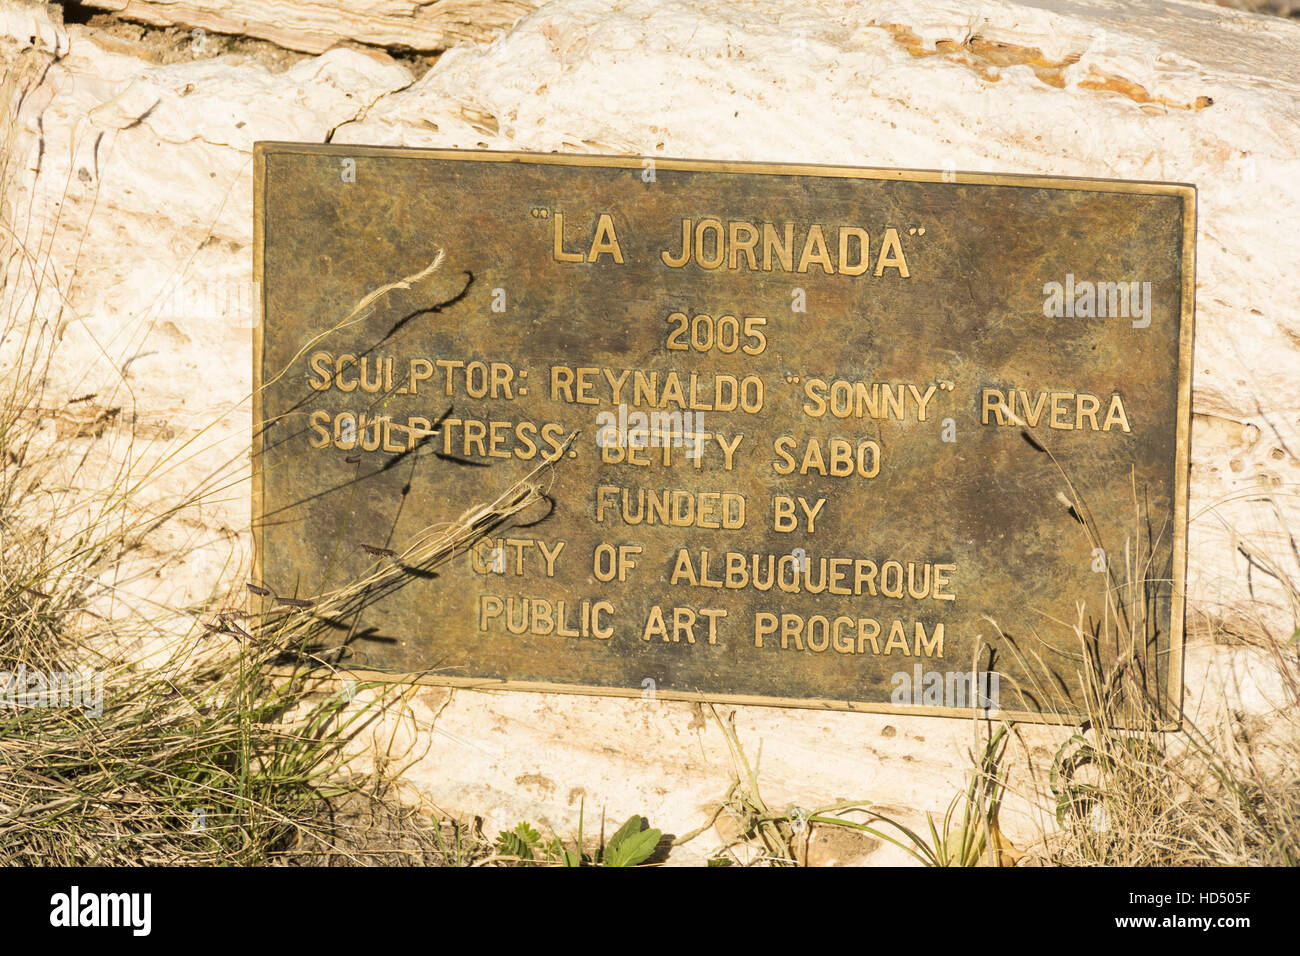 New Mexico, Albuquerque, Albuquerque Museum of Art and History, La Jornada sculpture by Reynaldo Sonny Rivera, 2005, - Stock Image